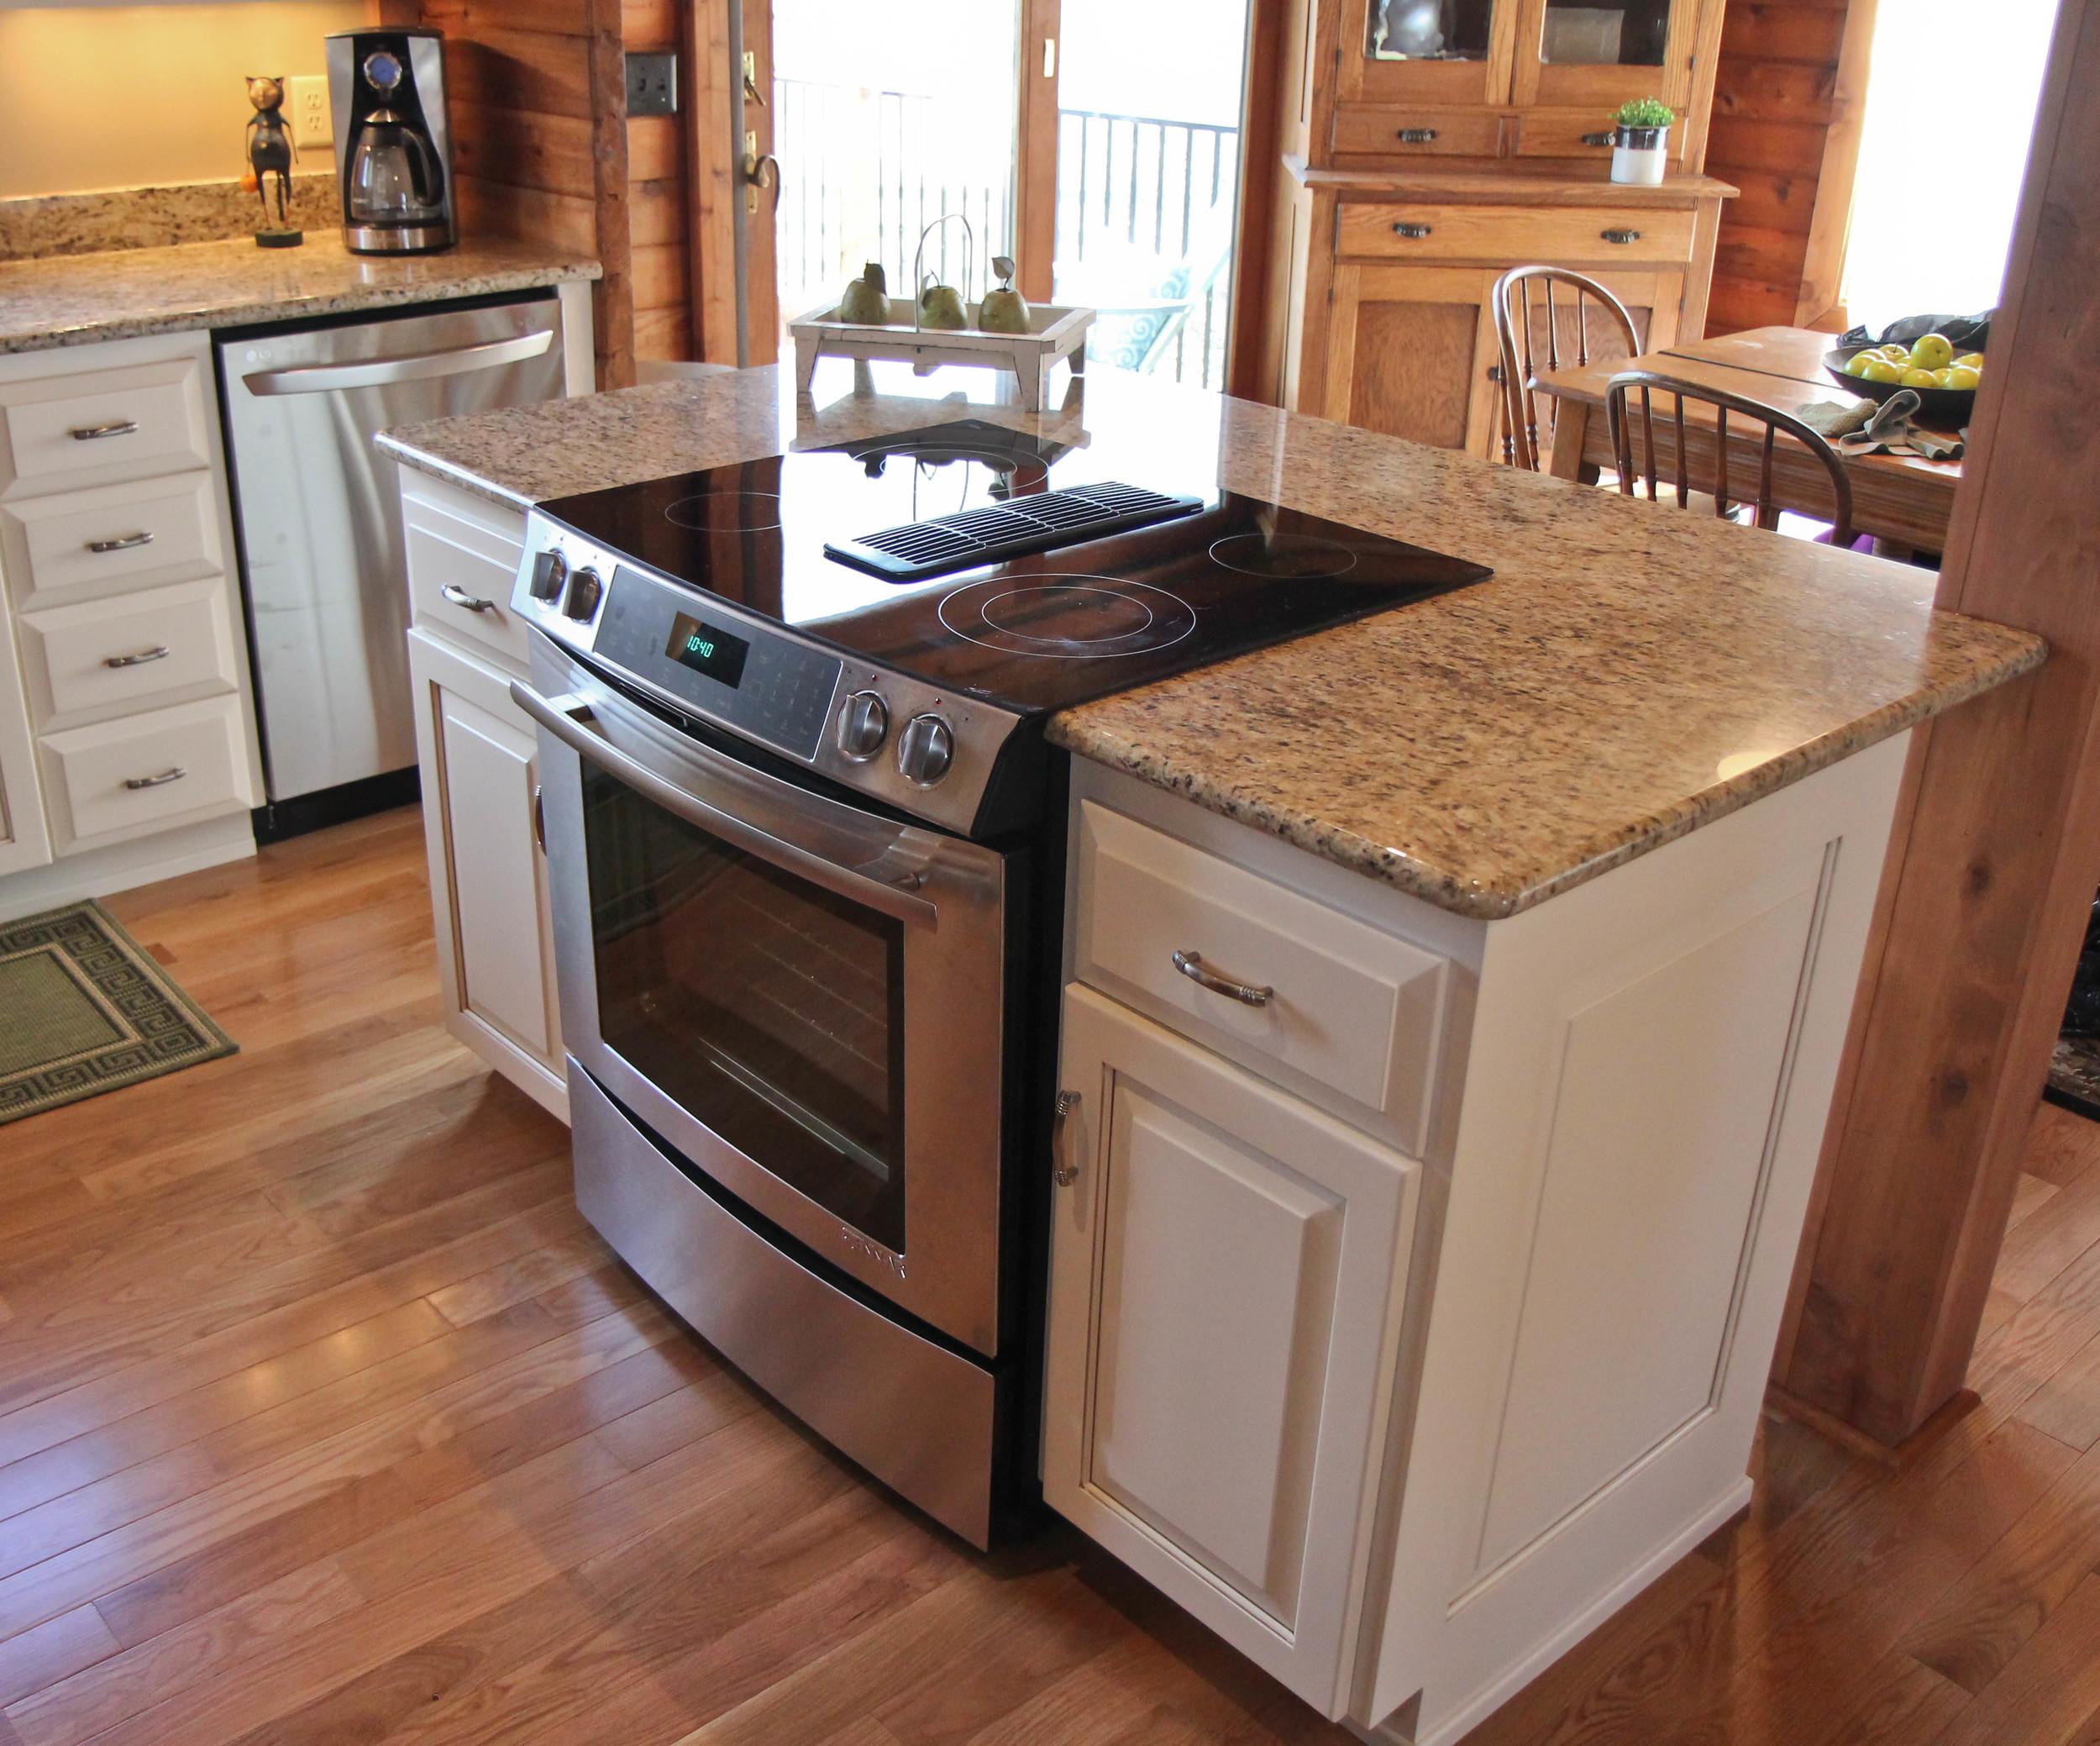 Kitchens pt 2-130.jpg